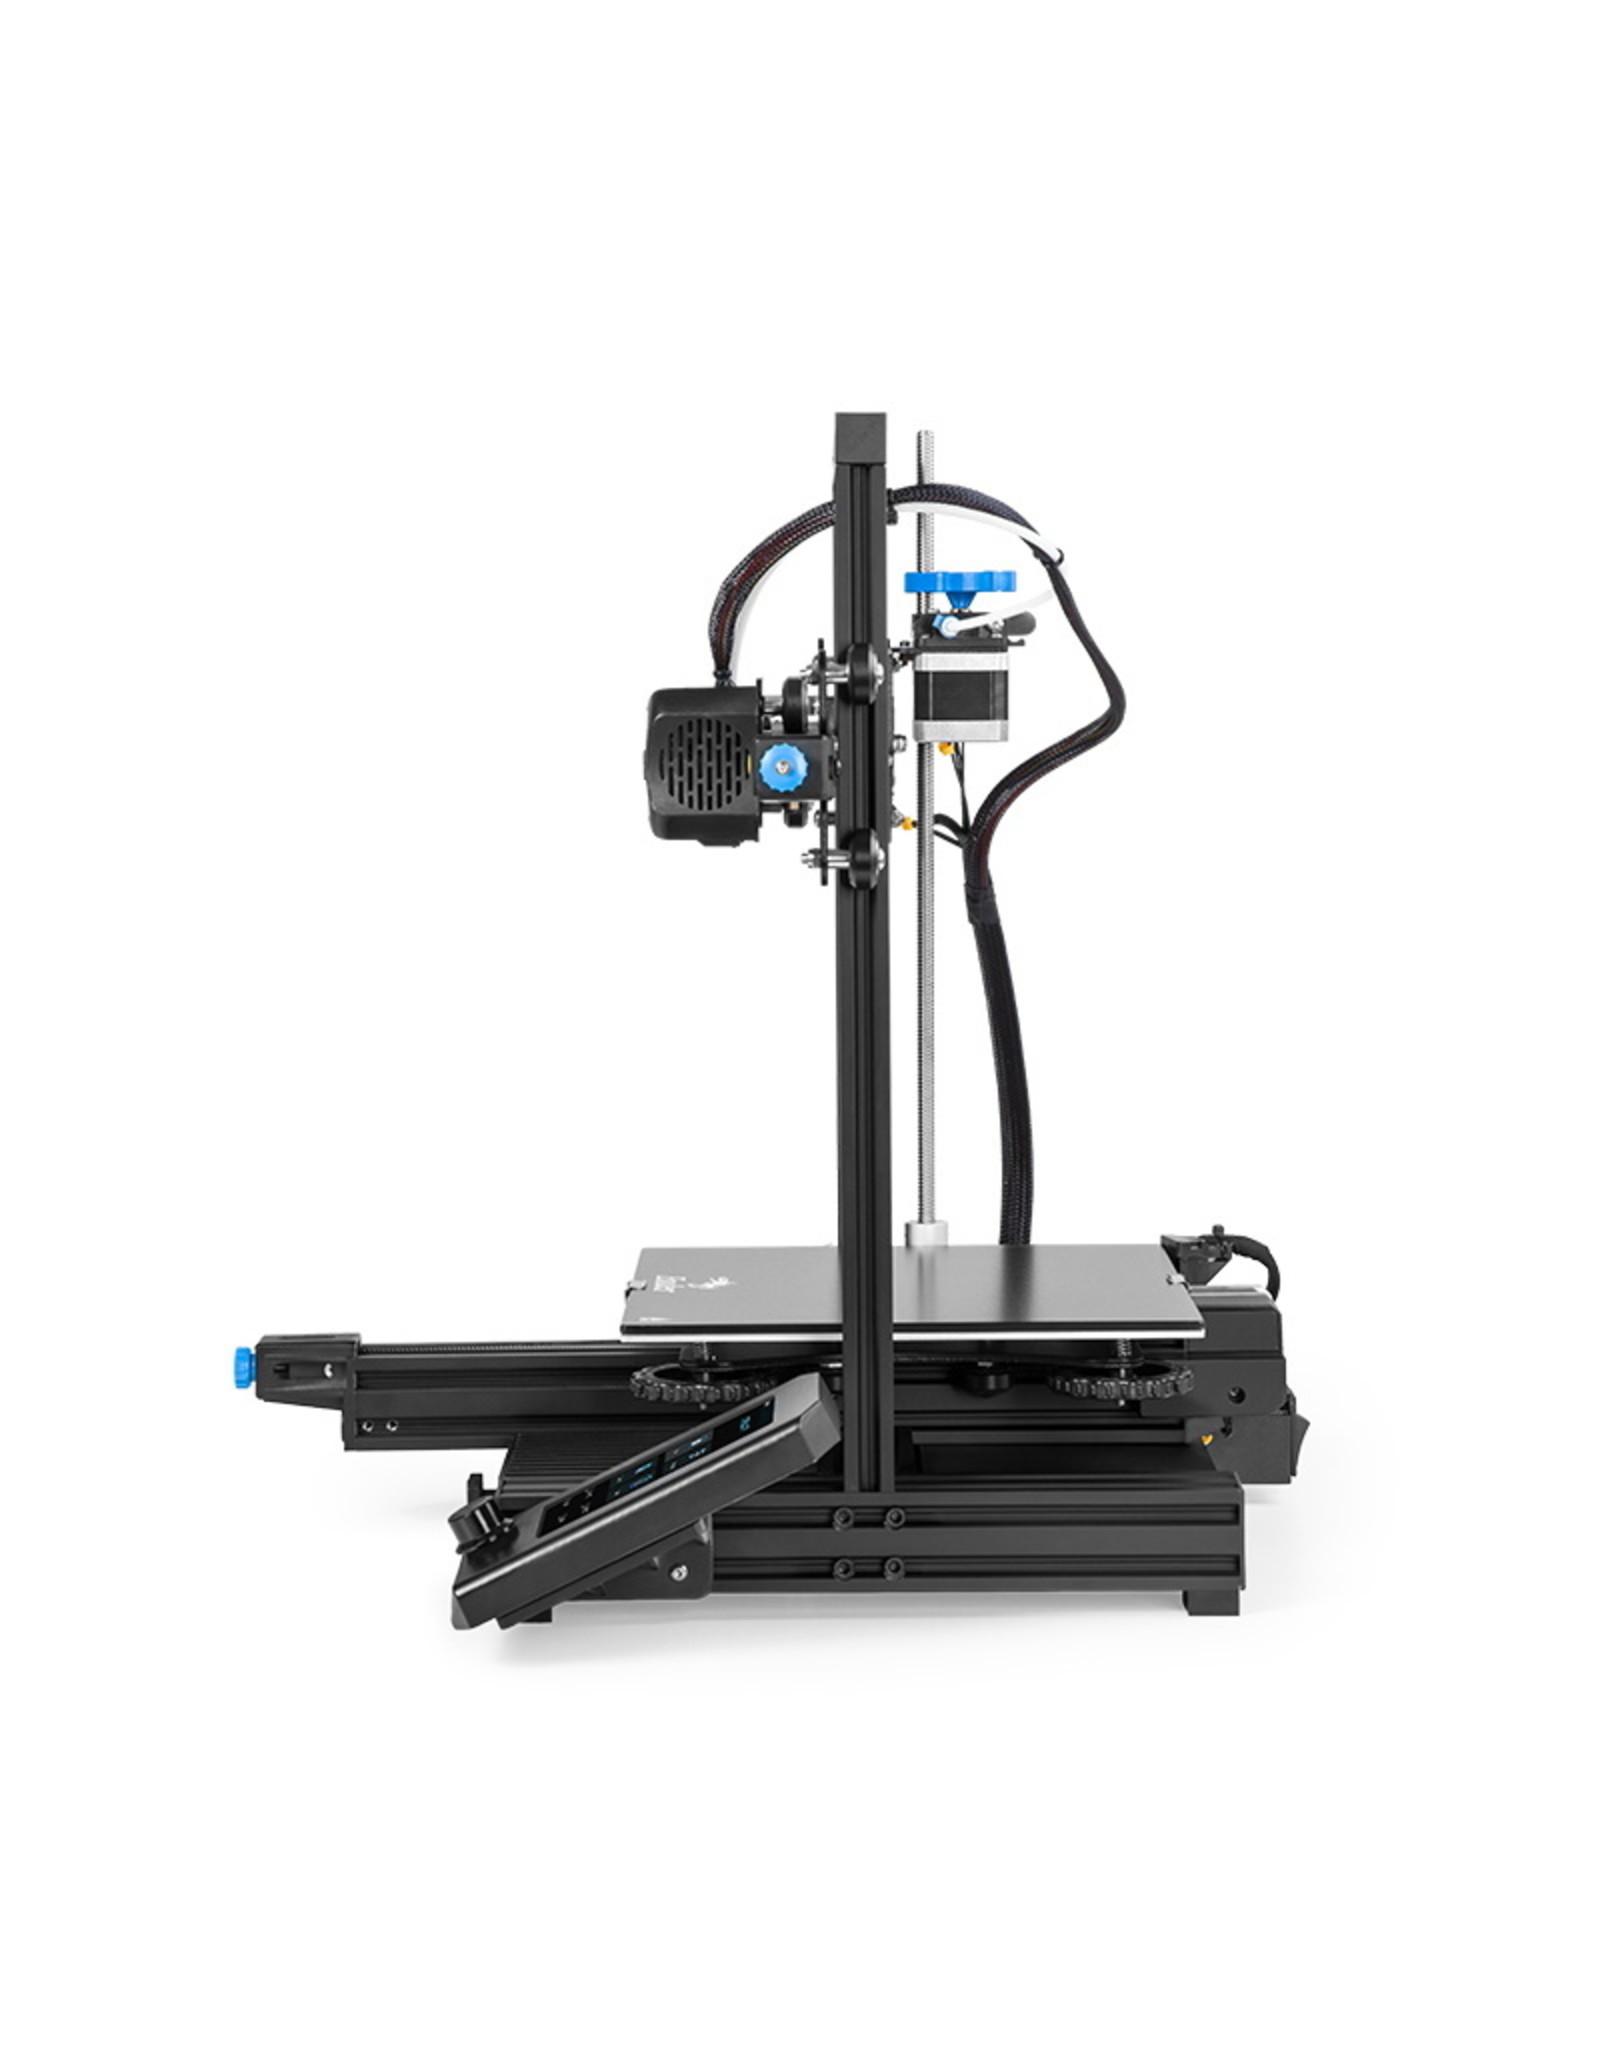 Creality/Ender Ender-3 V2 3D-printer NIEUW - 220x220x250 mm - GRATIS upgrade pack Alu extruder + Capricorn XS + stevige bedveren